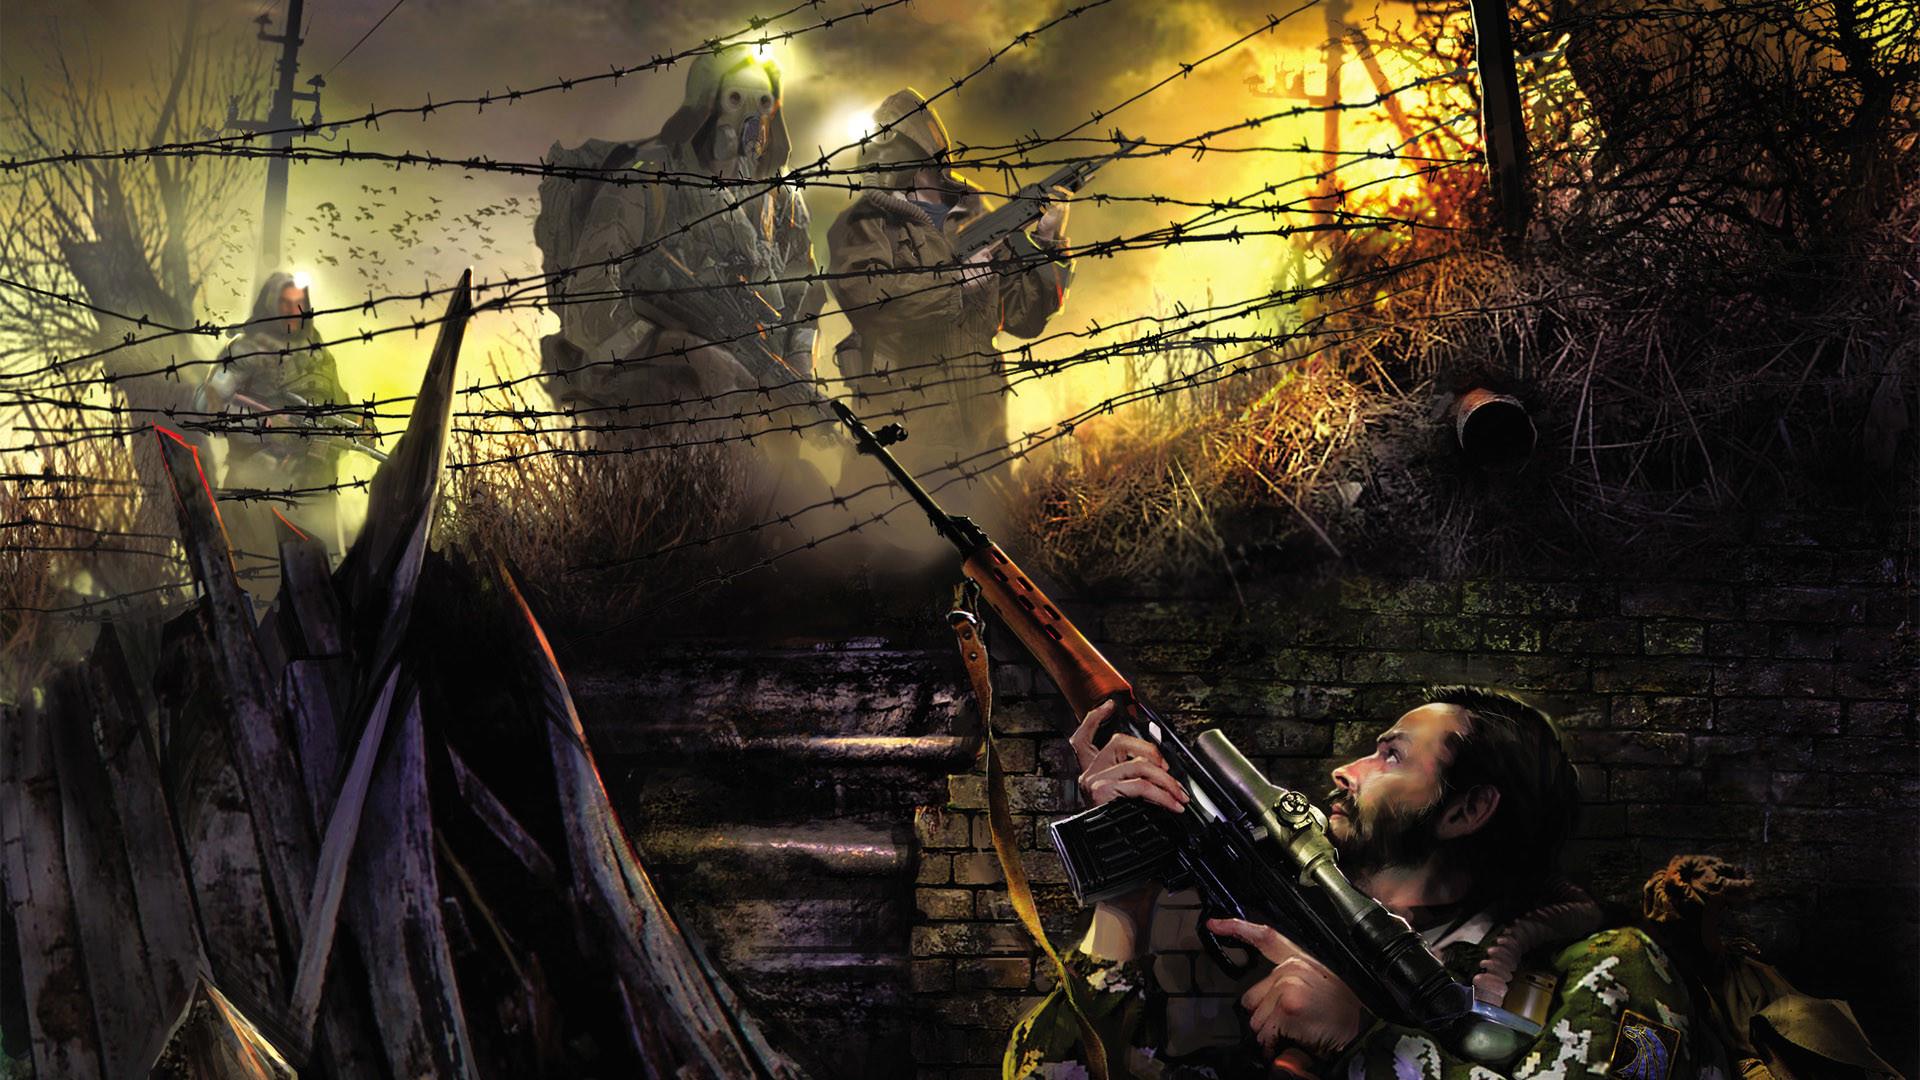 awesome gaming desktop wallpaper (45+ images)